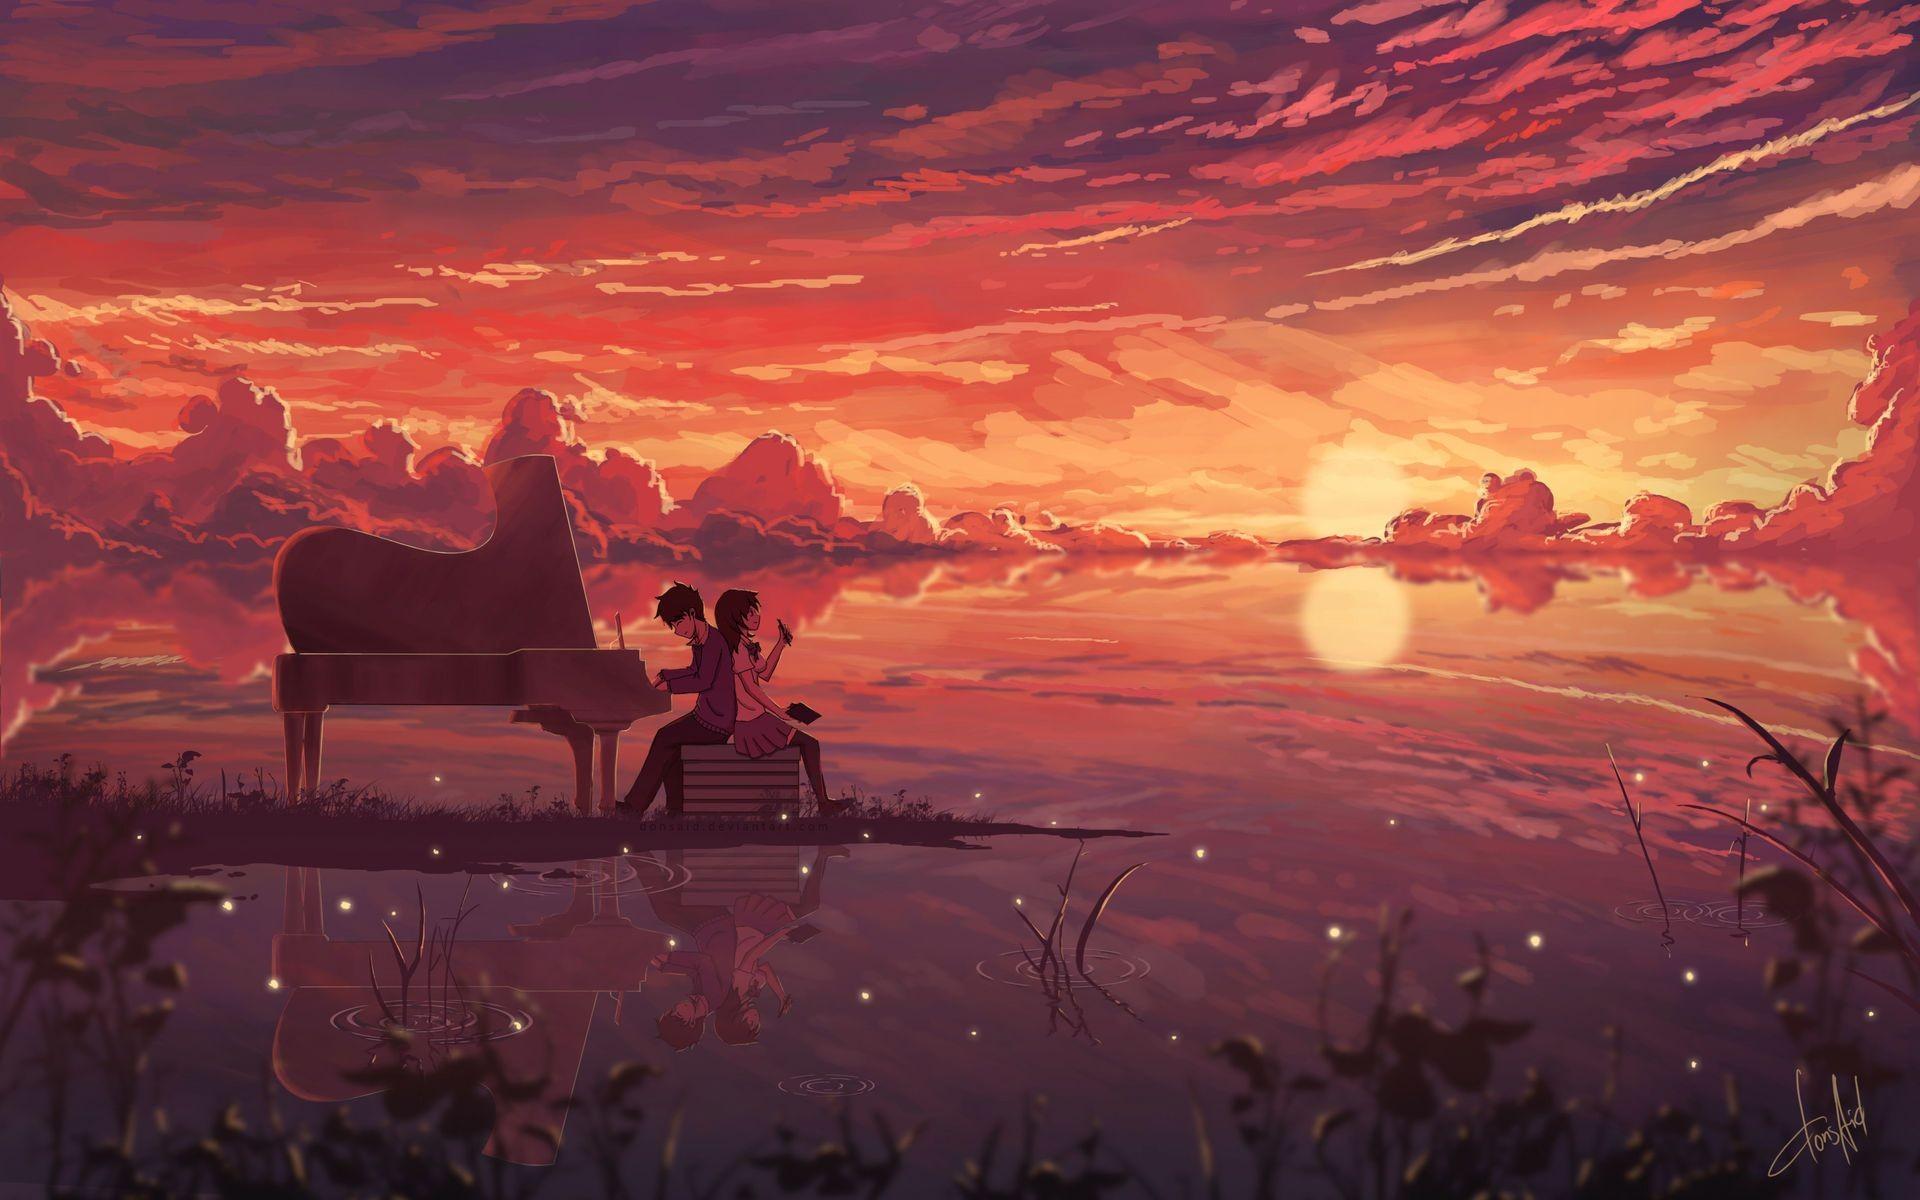 anime love digital art | anime hd 4k wallpapers